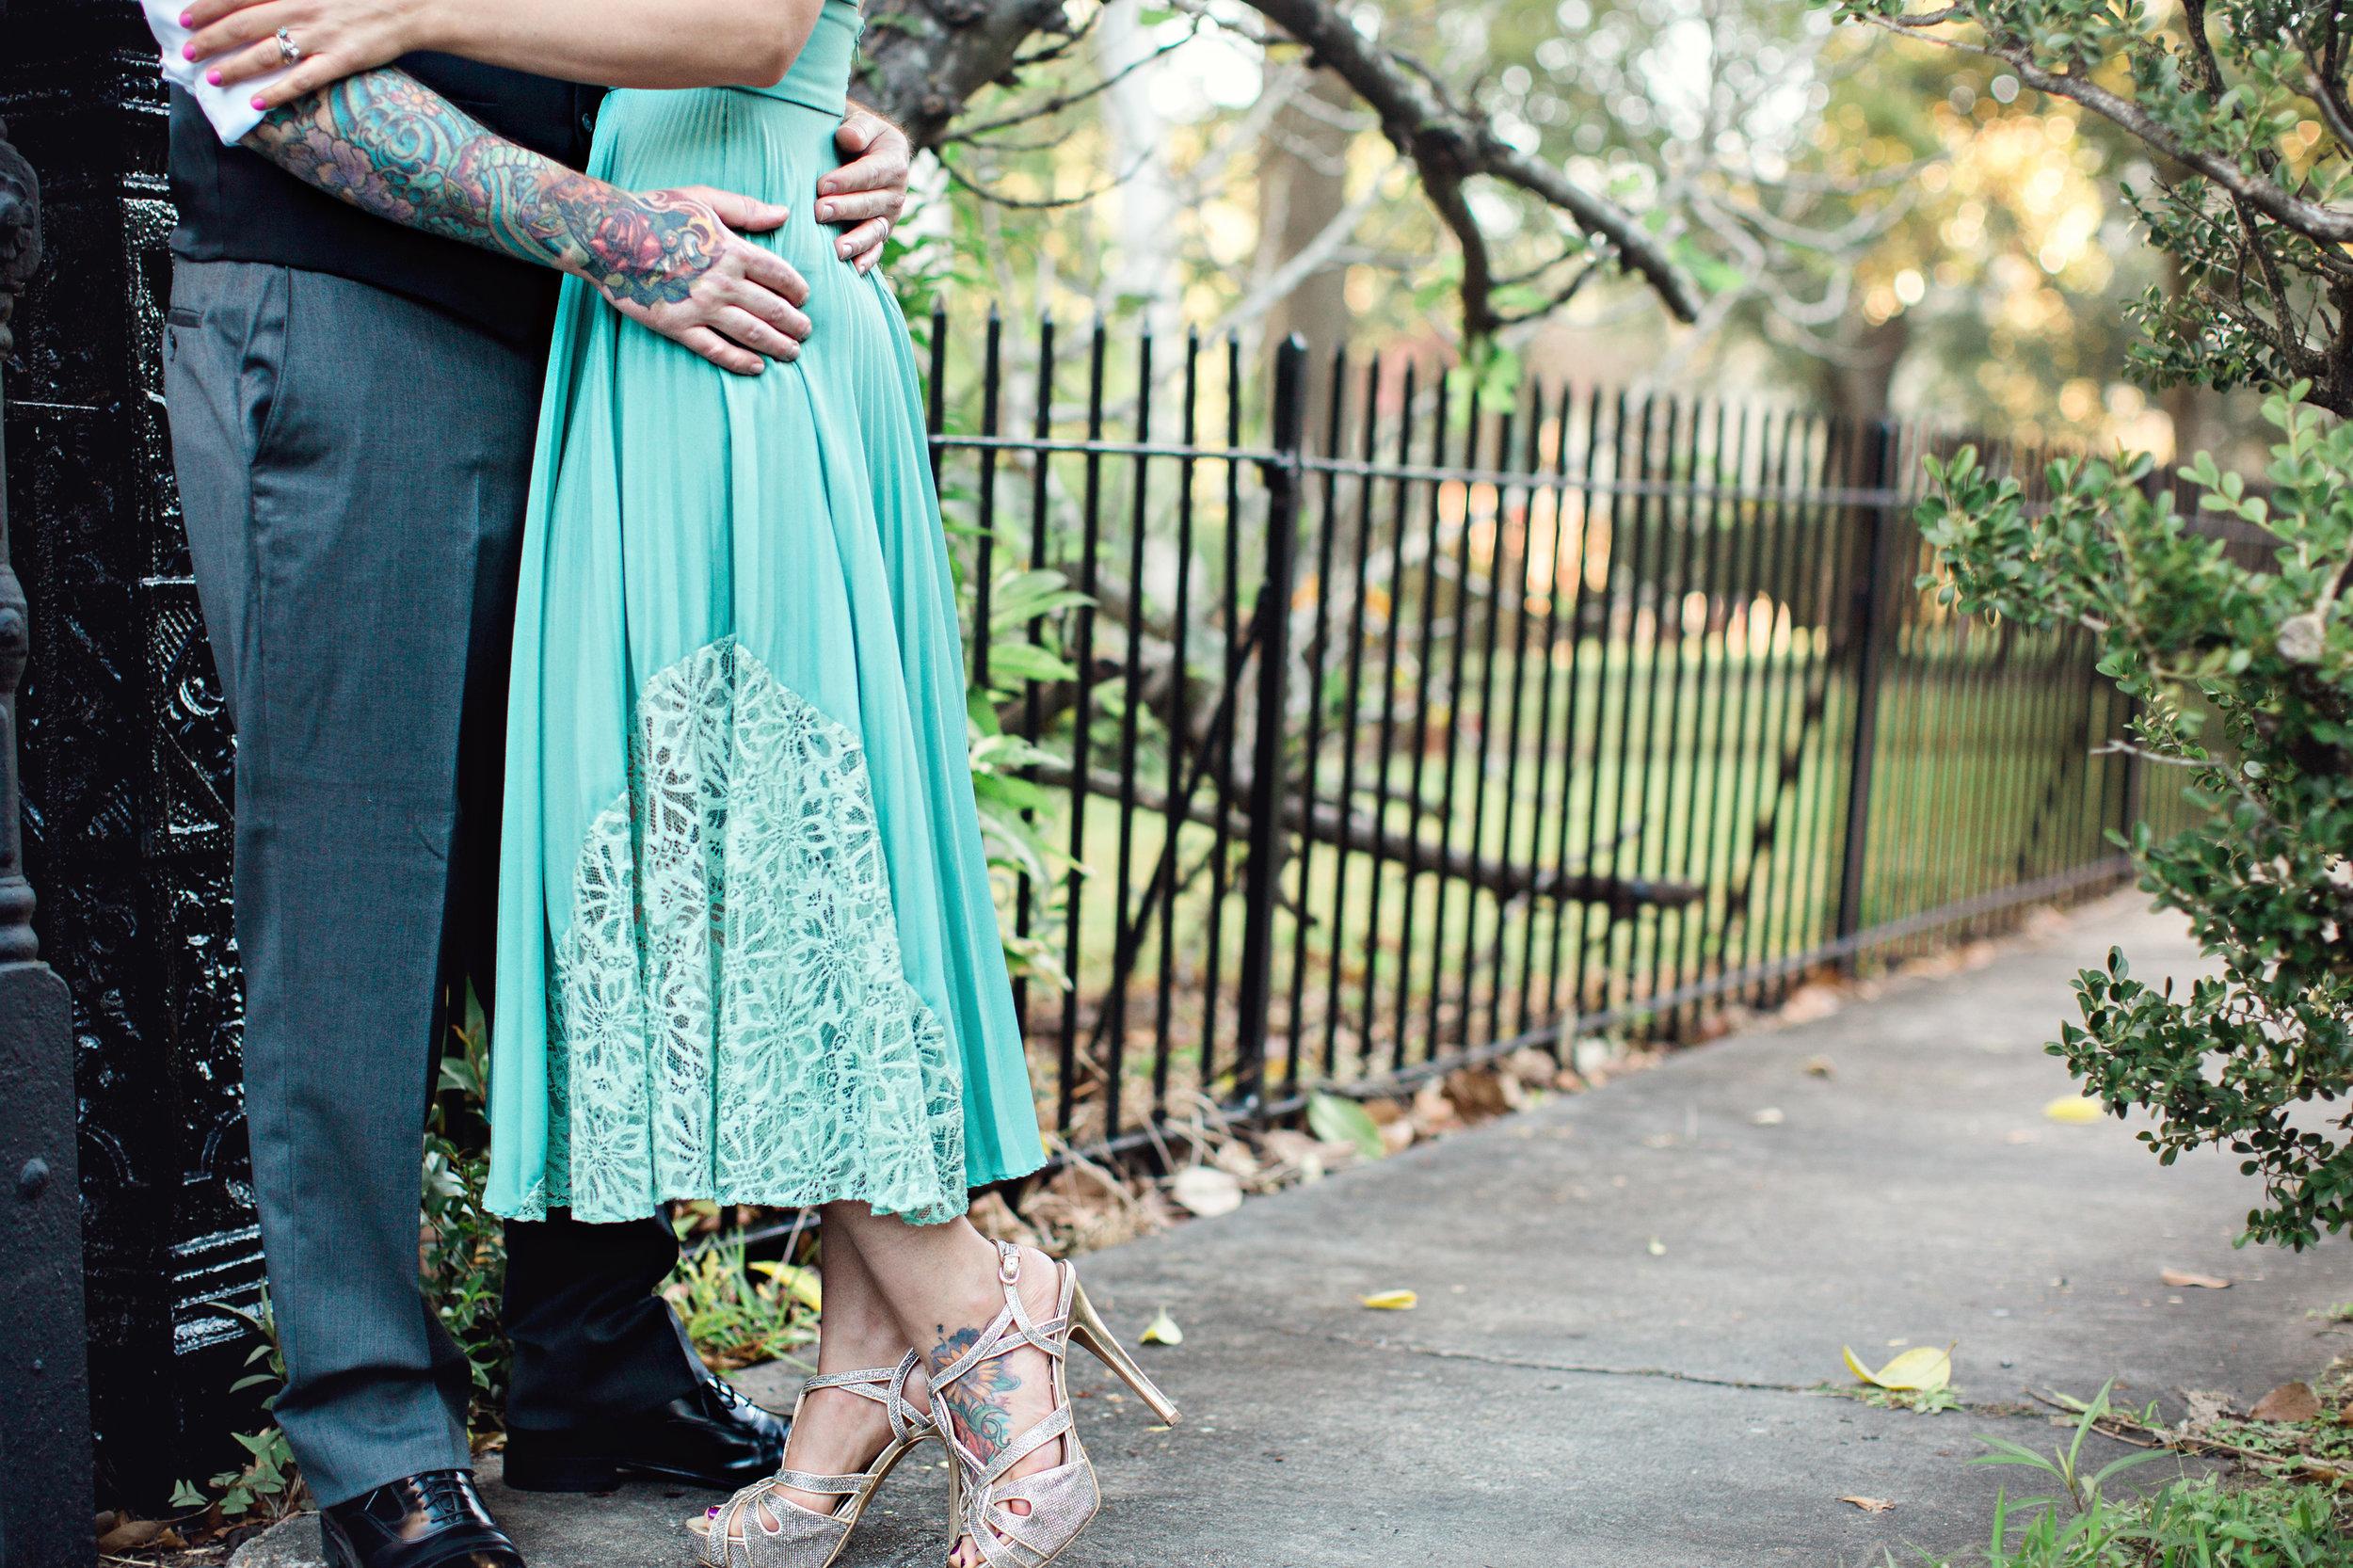 CindyGiovagnoliPhotography_Seattle_Washington_PNW_Couple_Engagement_Portrait_Photography-001.jpg